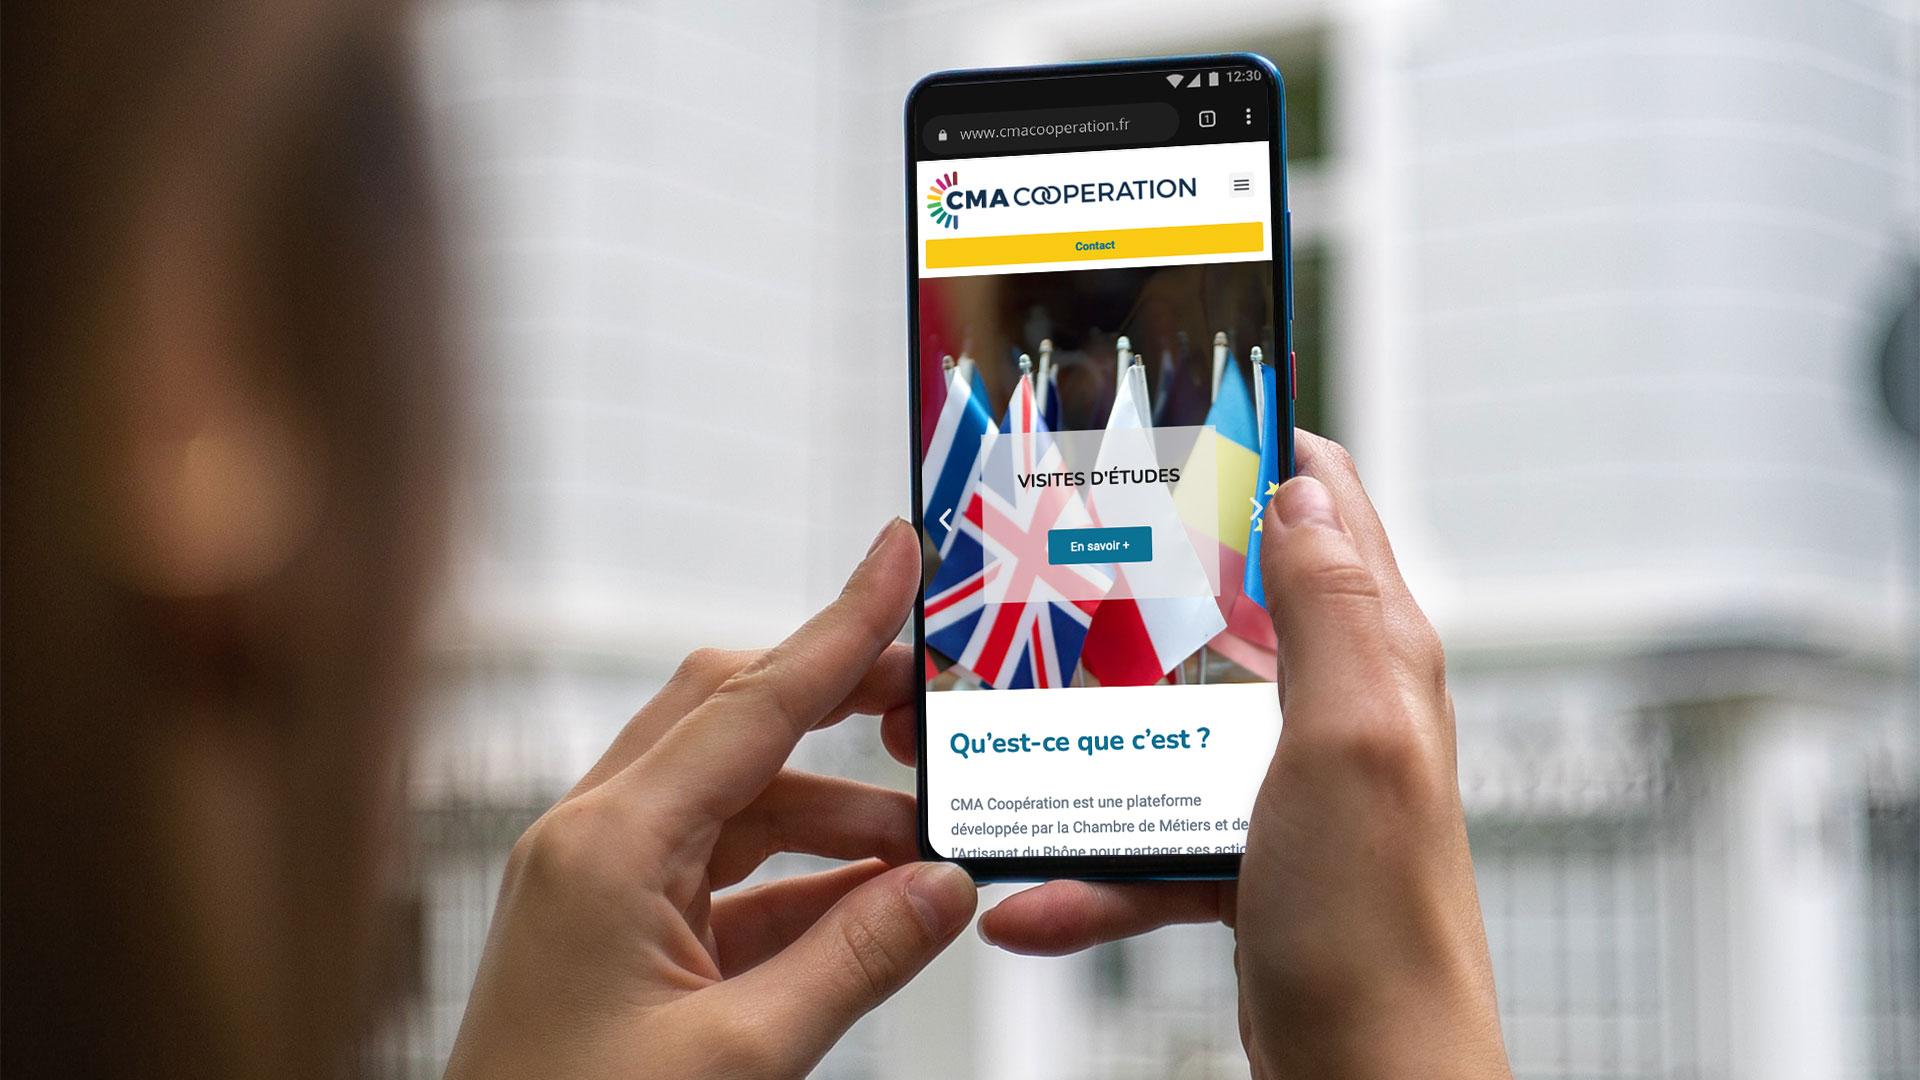 Cma coopération site mobile